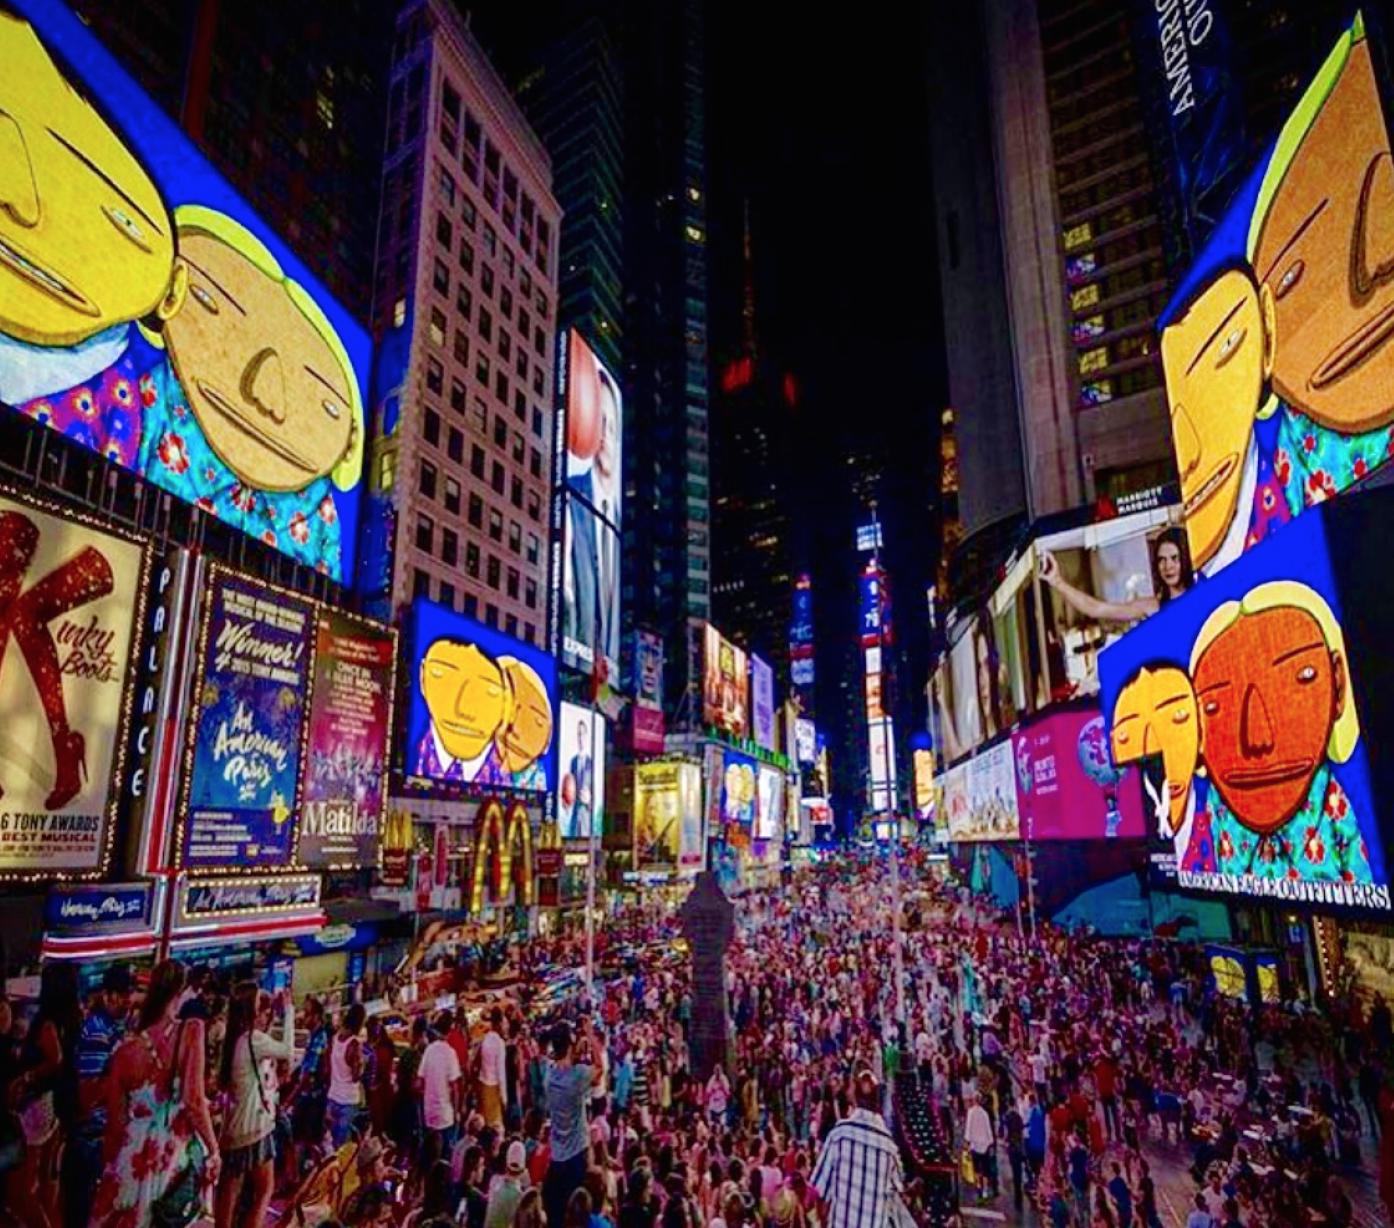 Os Gemeos (aka: Gustavo & Otávio Pandolfo) in Times Square